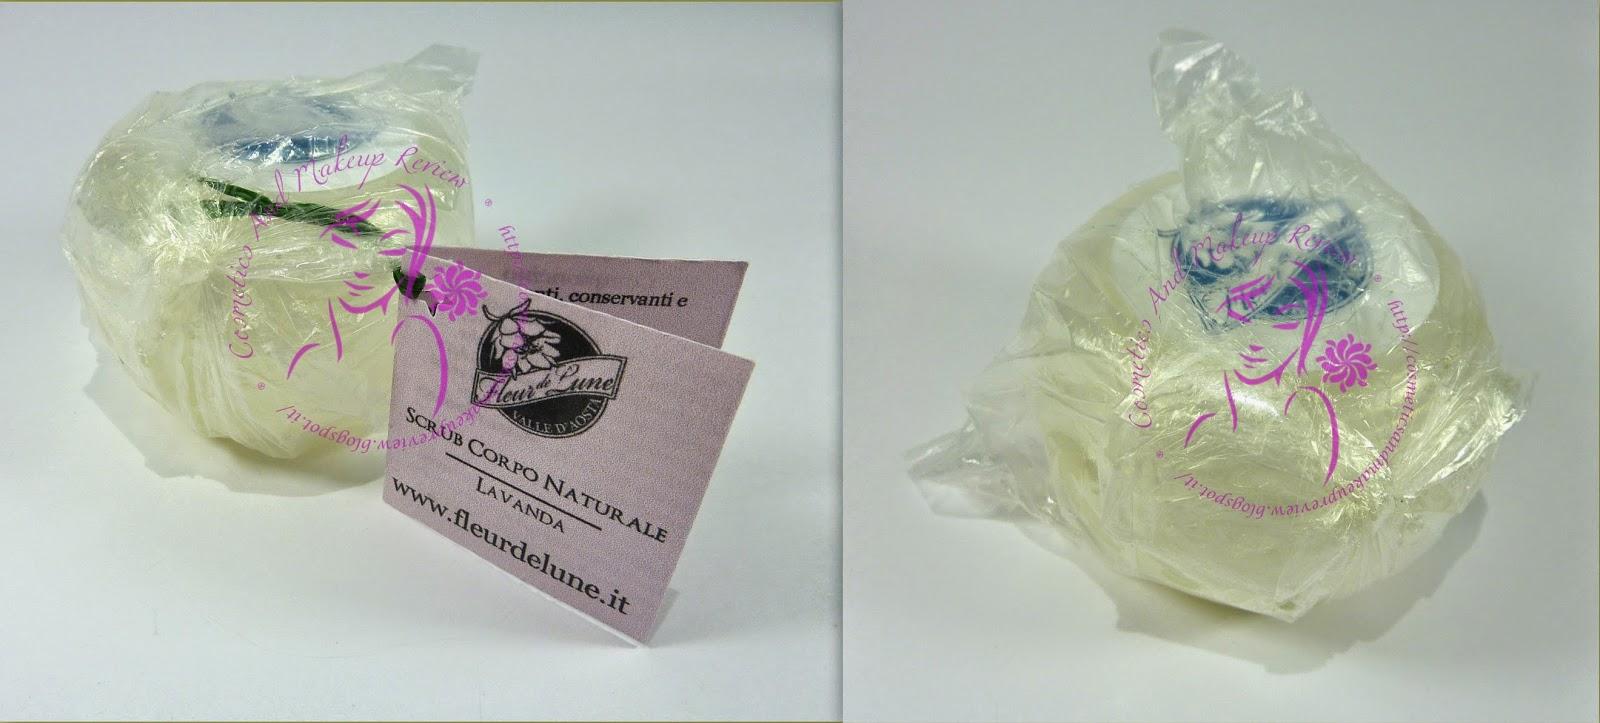 Fleur de Lune - Scrub Corpo Naturale alla Lavanda - packaging